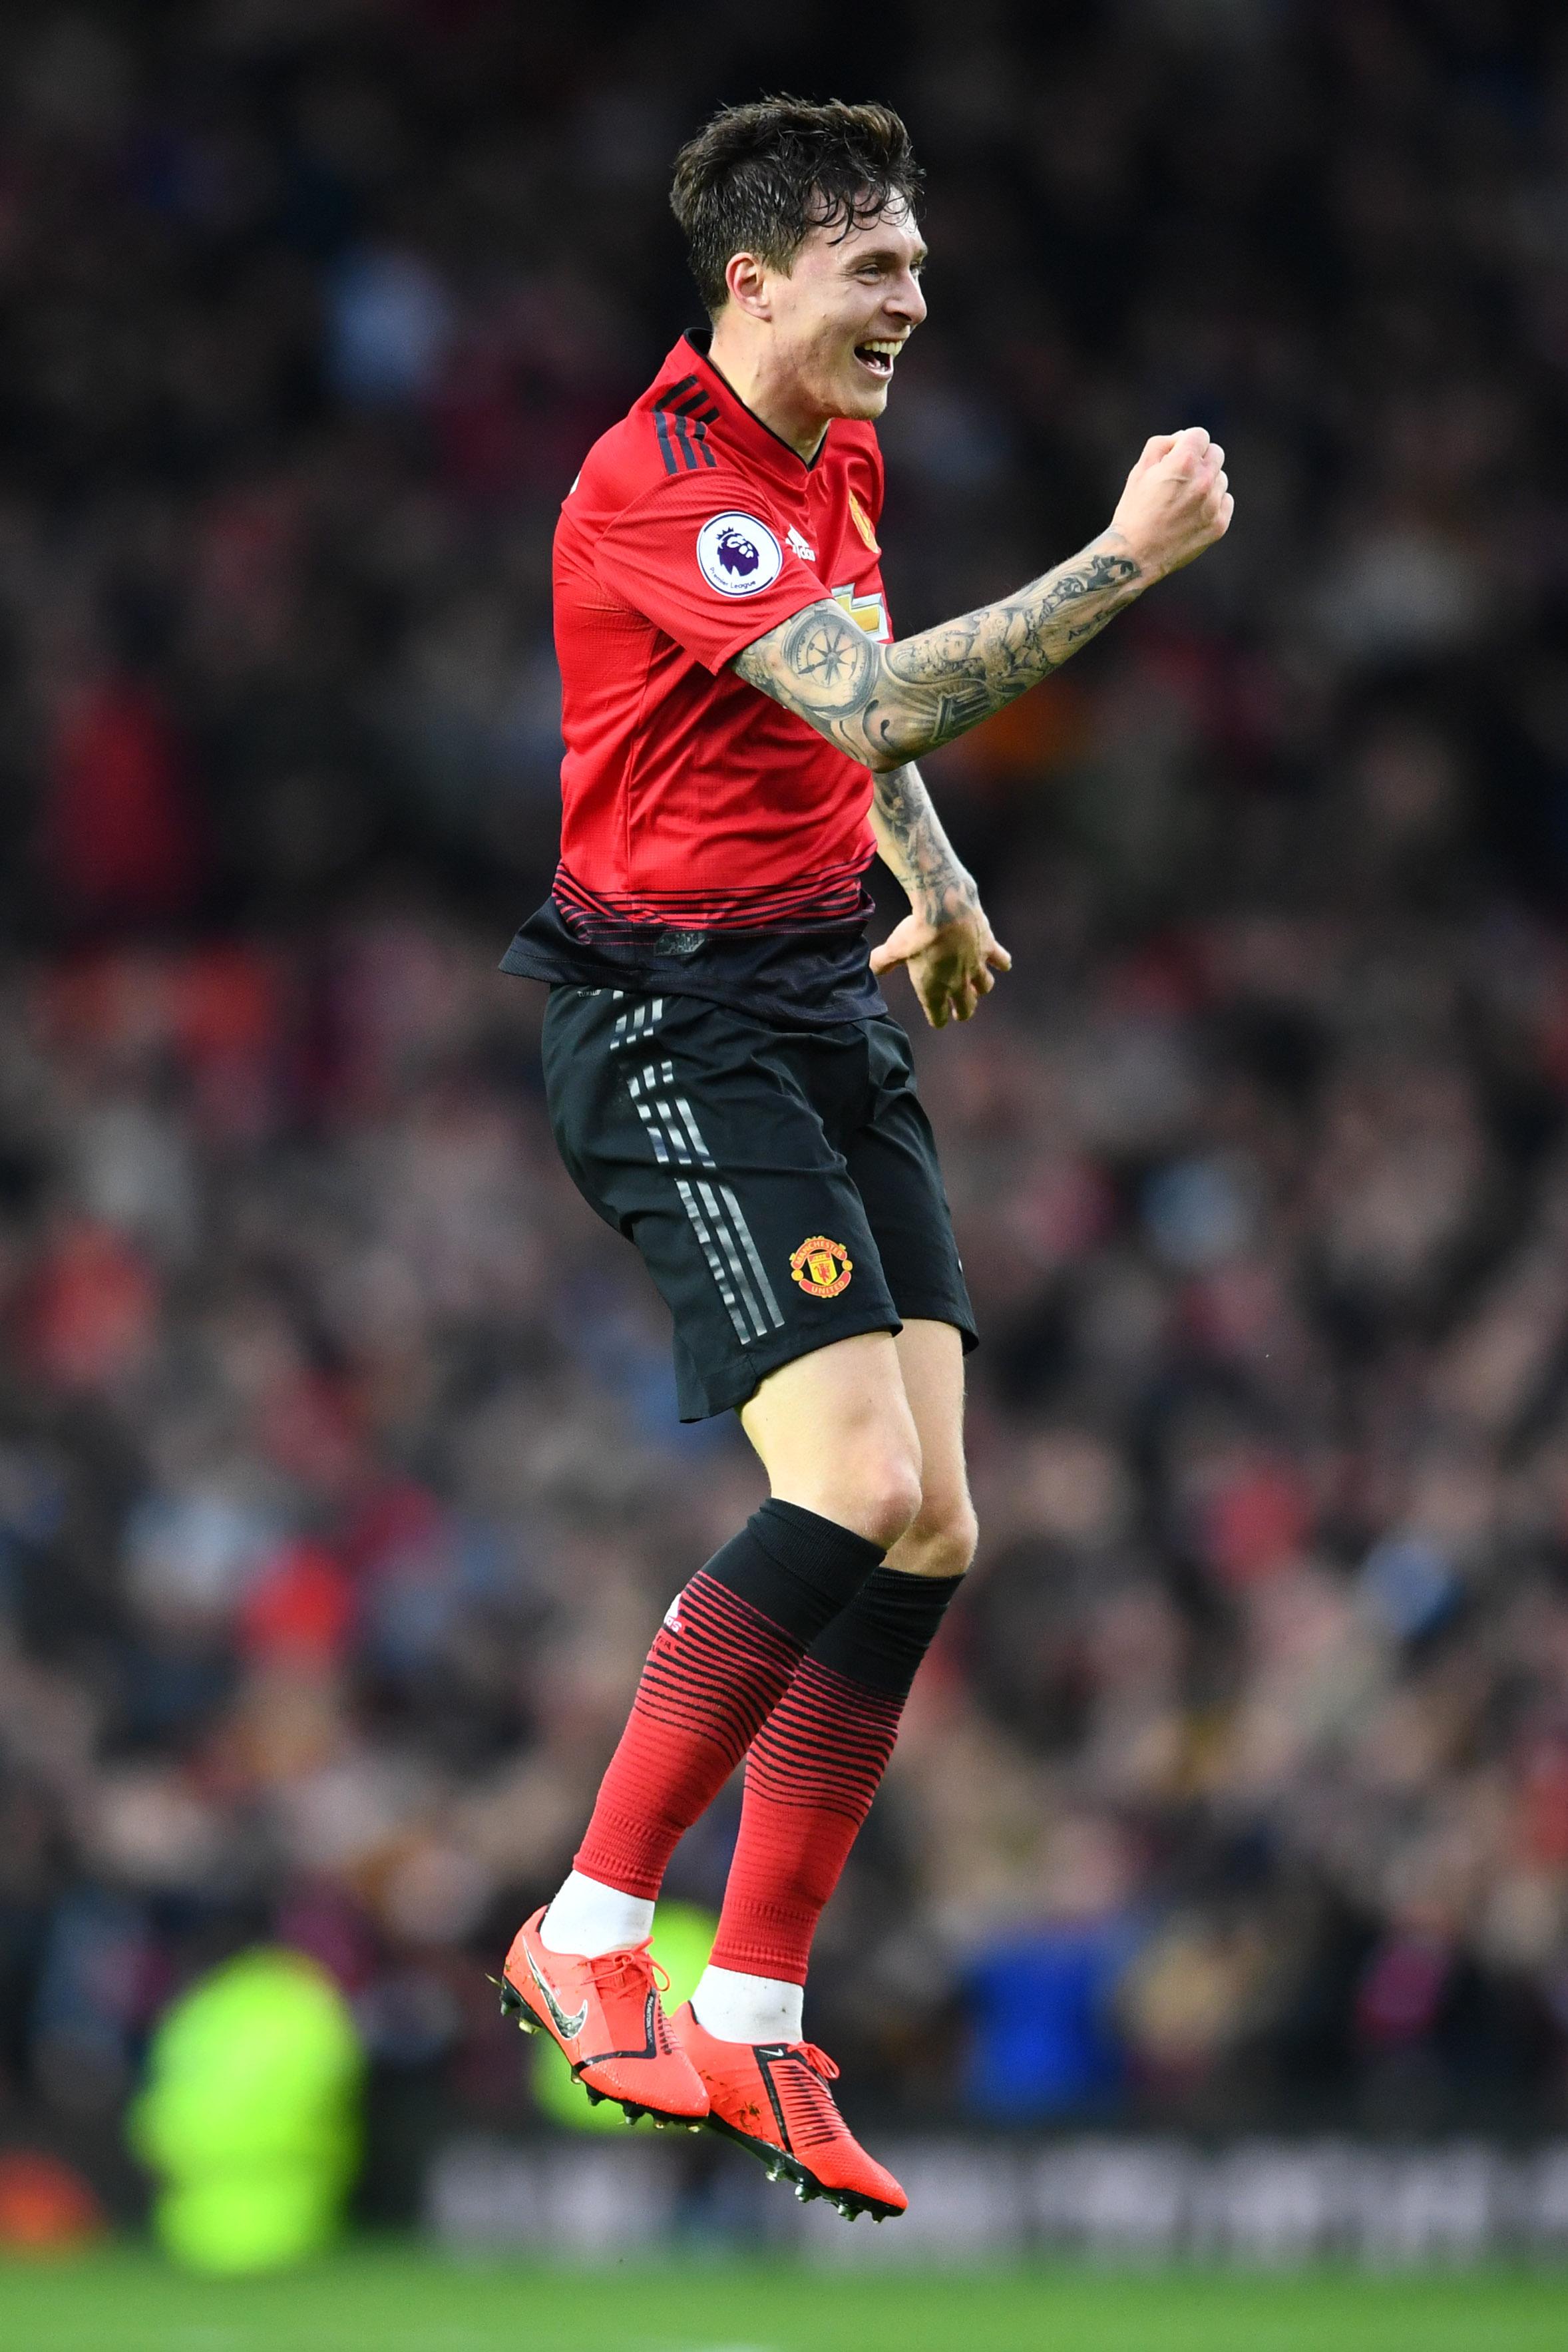 Manchester United 2018-19 Player Reviews: Victor Lindelöf